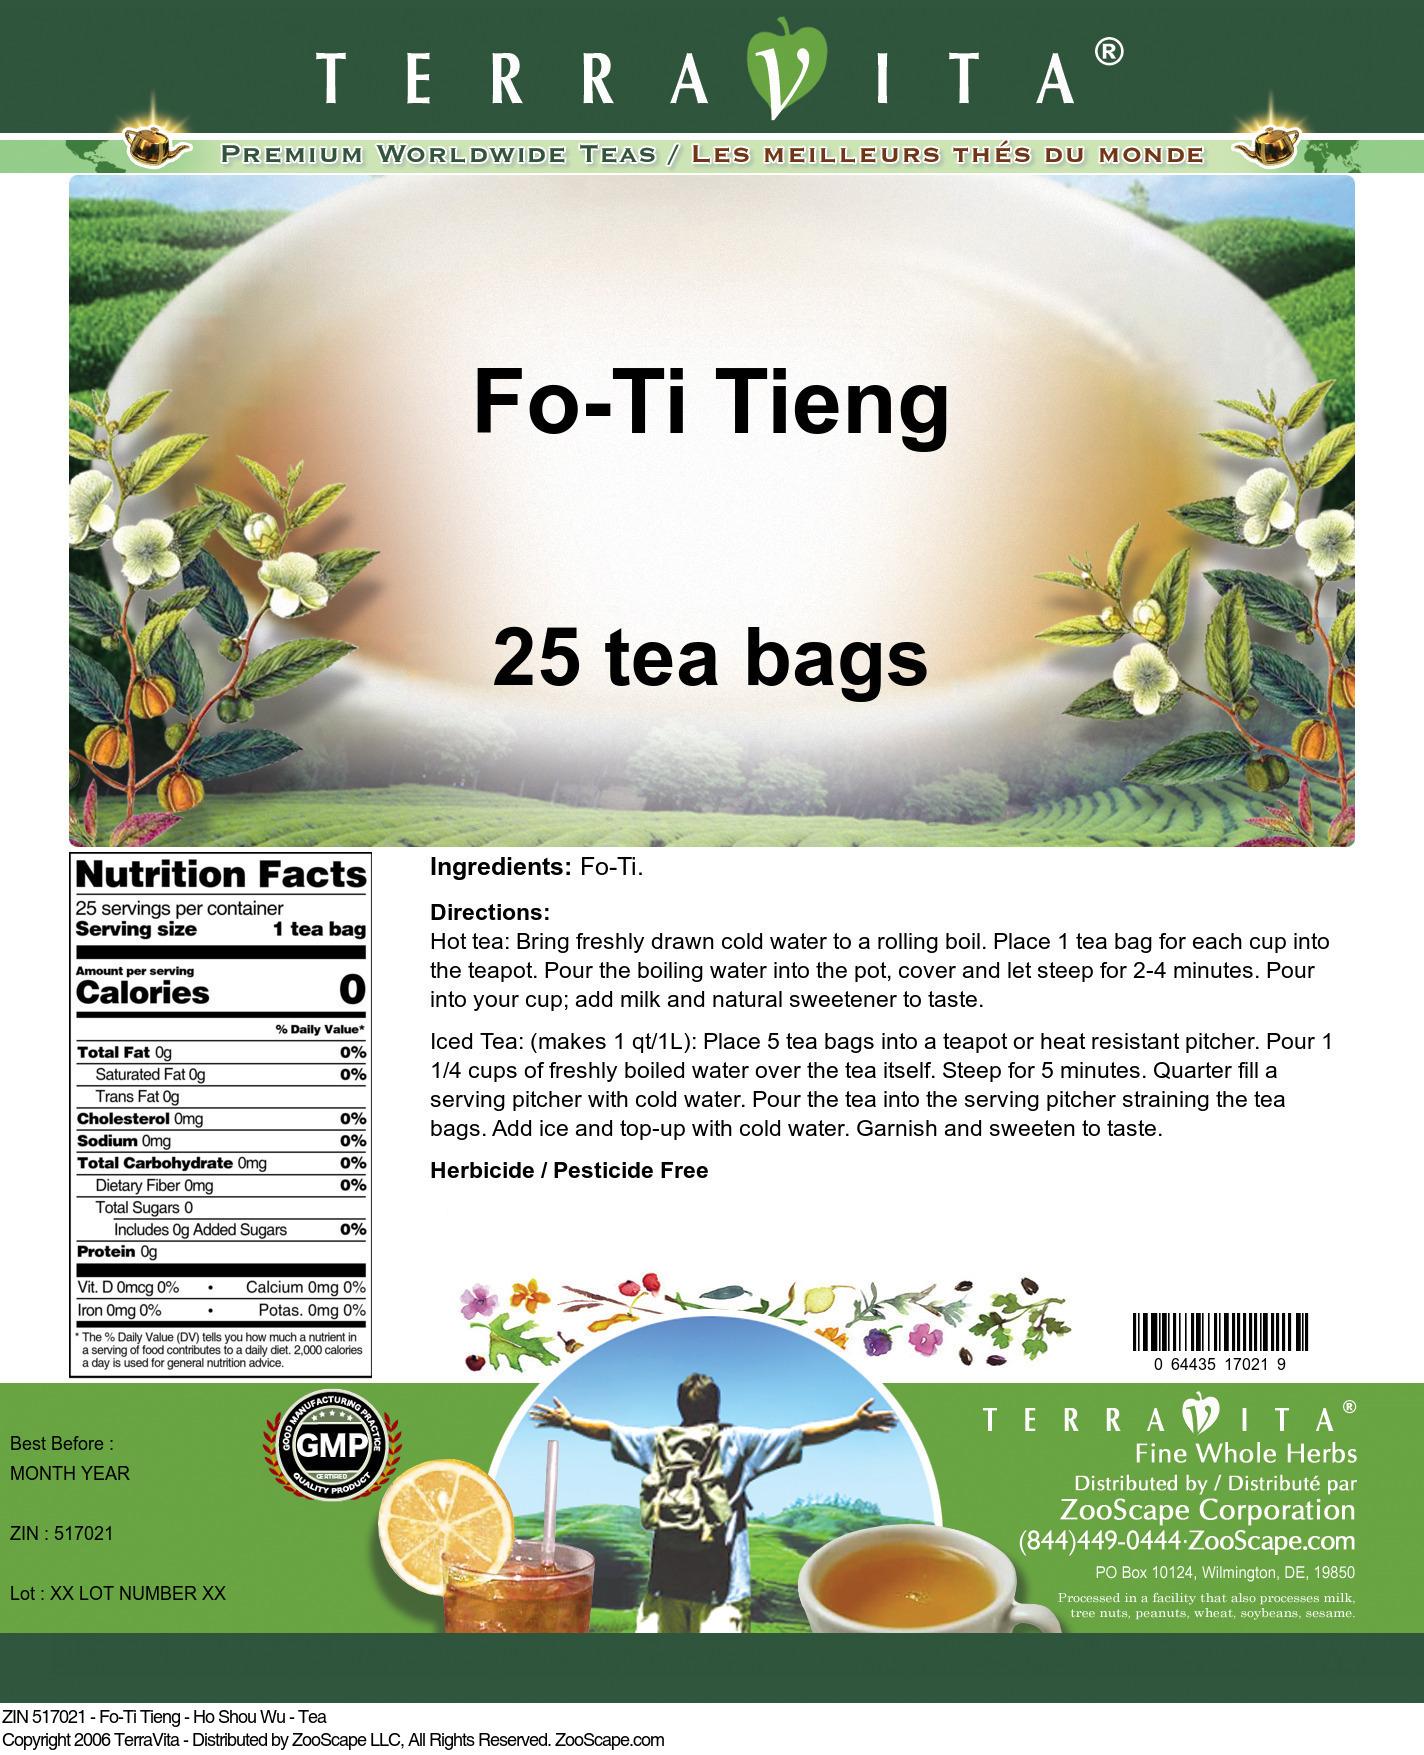 Fo-Ti Tieng - Ho Shou Wu - Tea